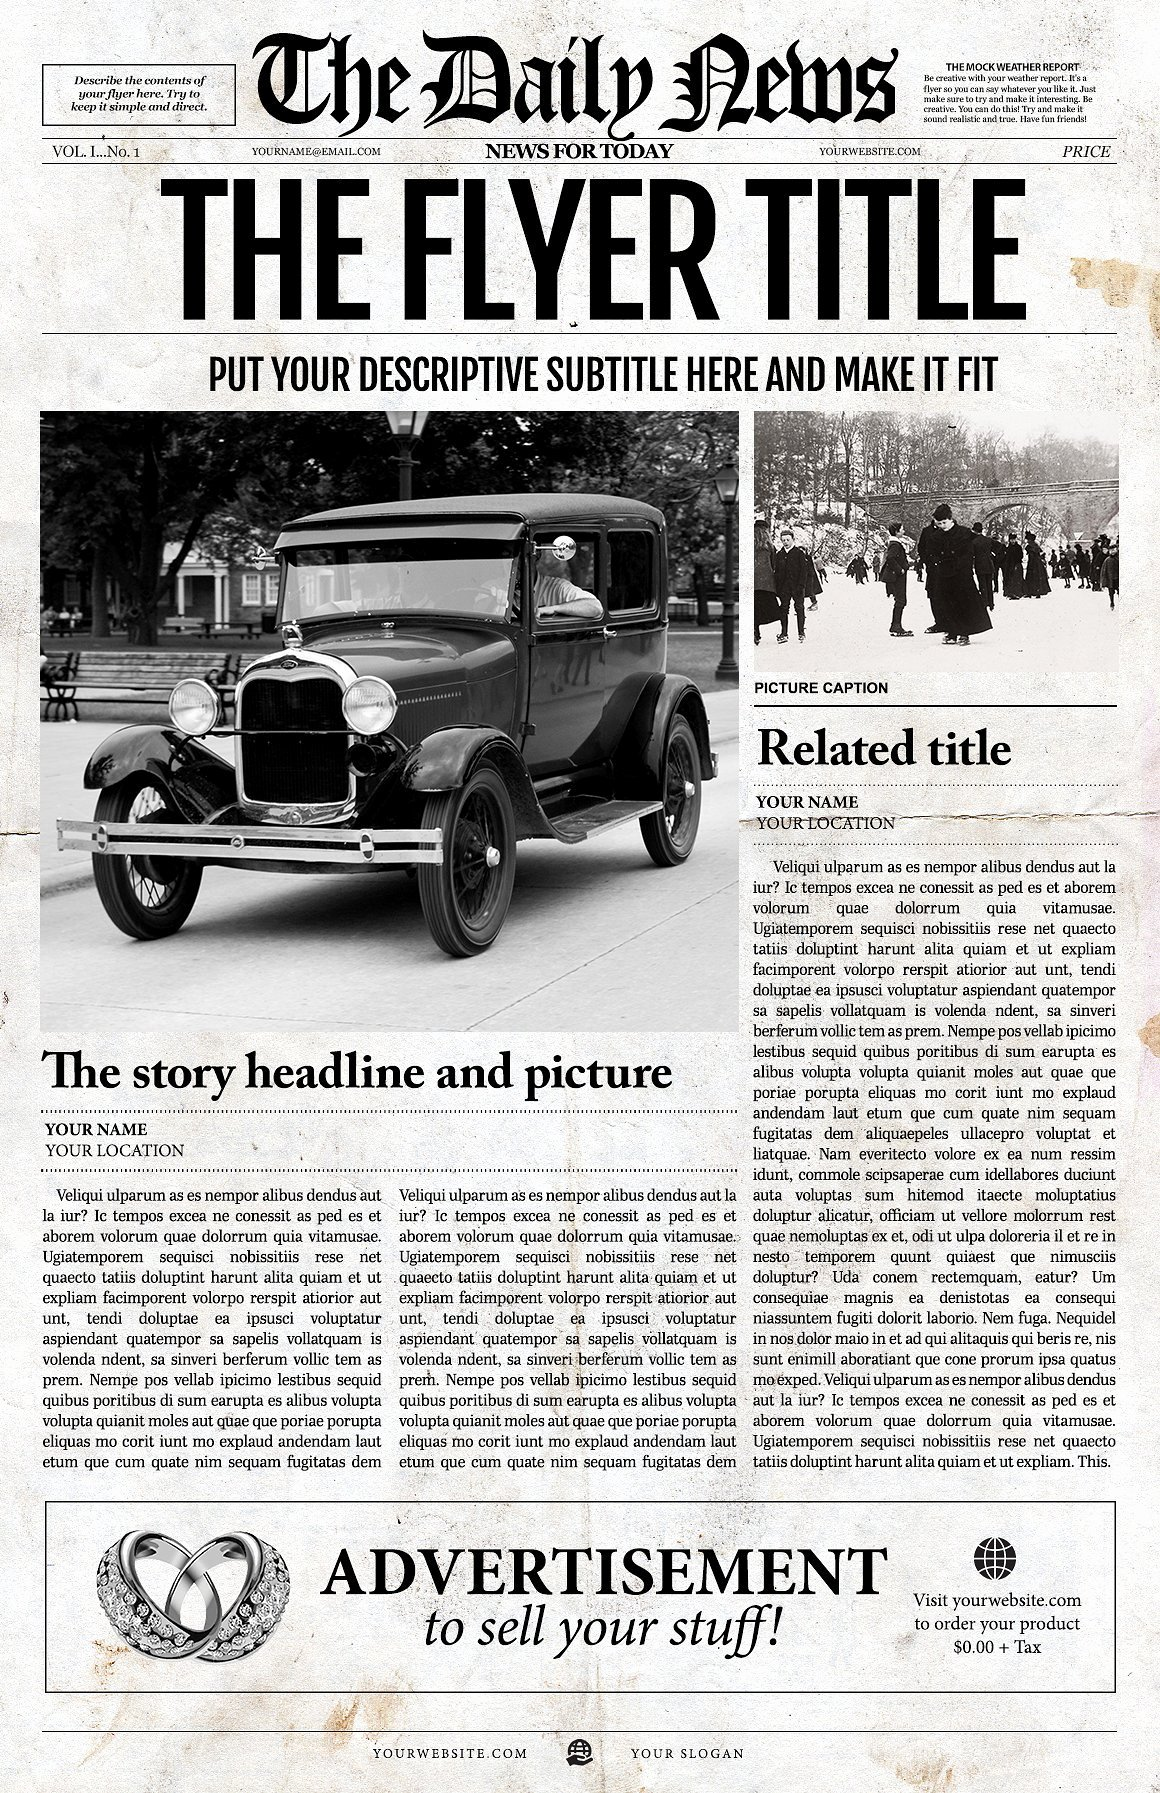 New York Times Newspaper Template Inspirational 1 Page Newspaper Template Ai Flyer Templates Creative Market